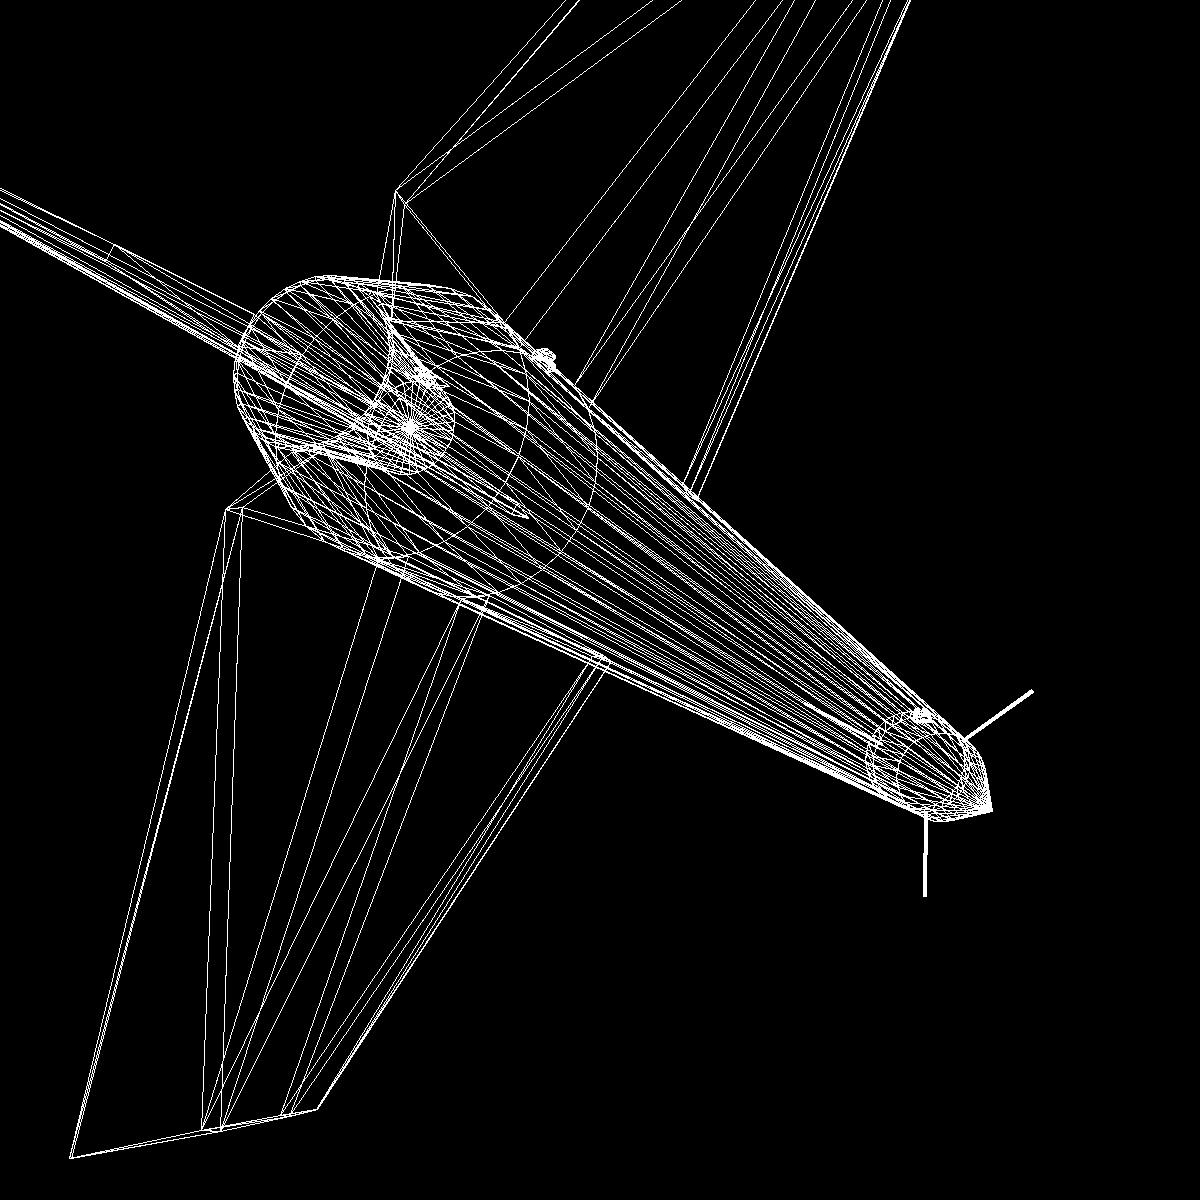 melna brant ii skanoša raķete 3d modelis 3ds dxf cob x obj 150853